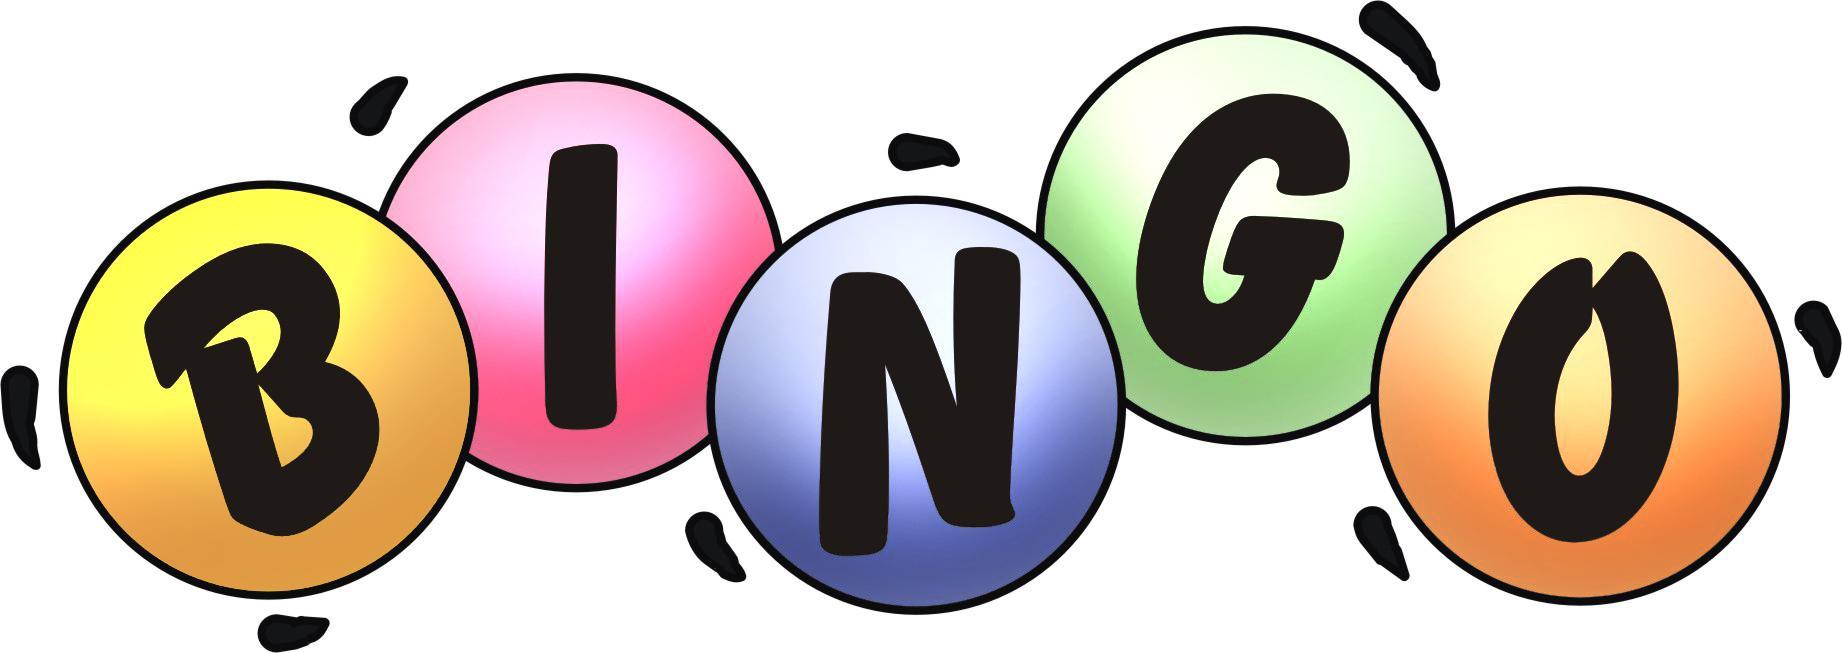 Bingo Cancelled On Friday 3 15 .